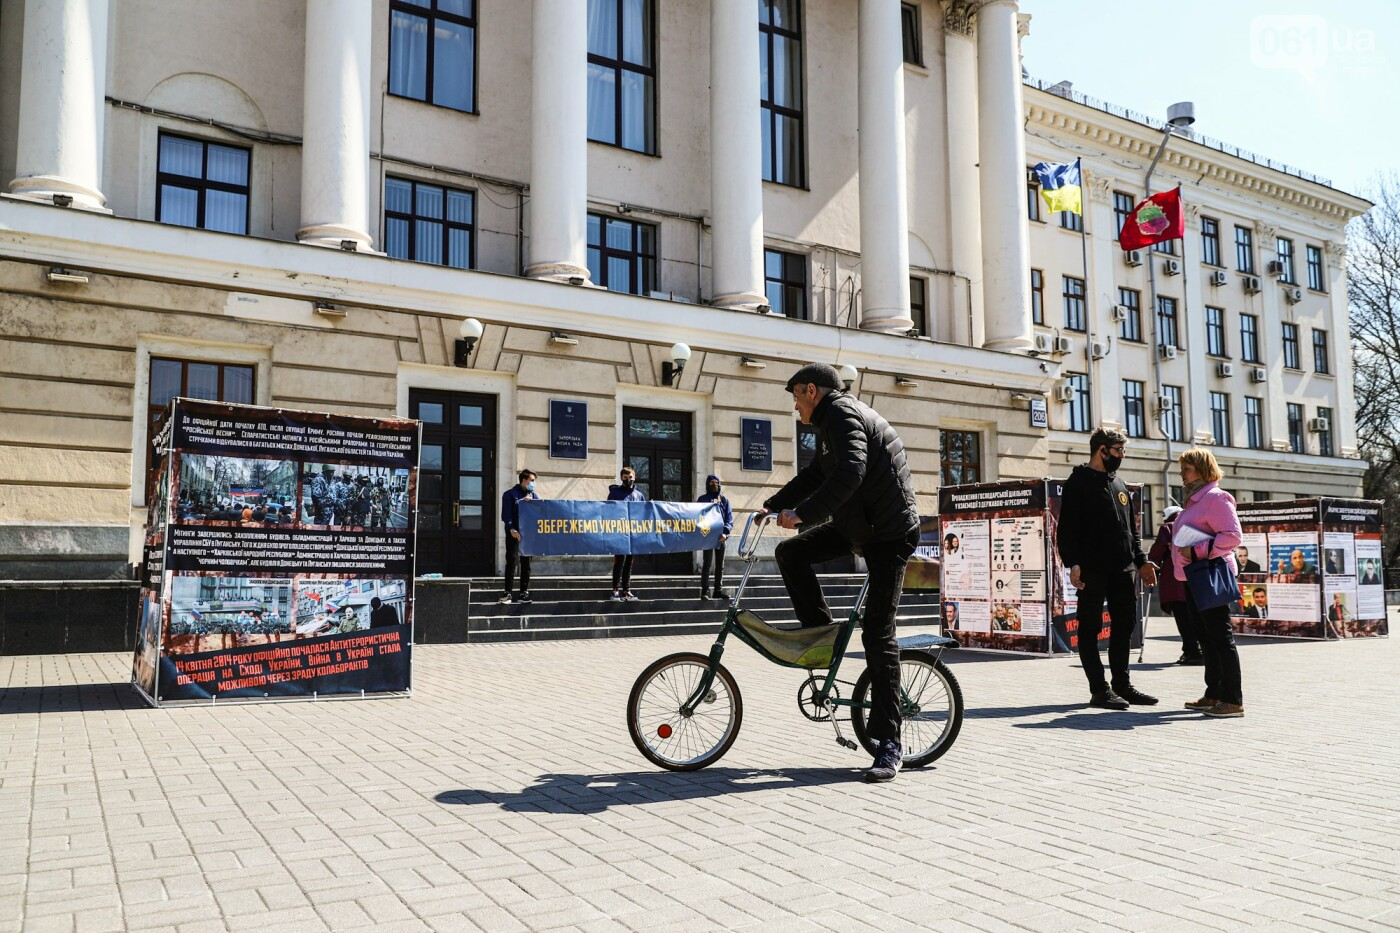 В Запорожье возле мэрии установили стенды с портретами Медведчука и Шария, - ФОТО, фото-17